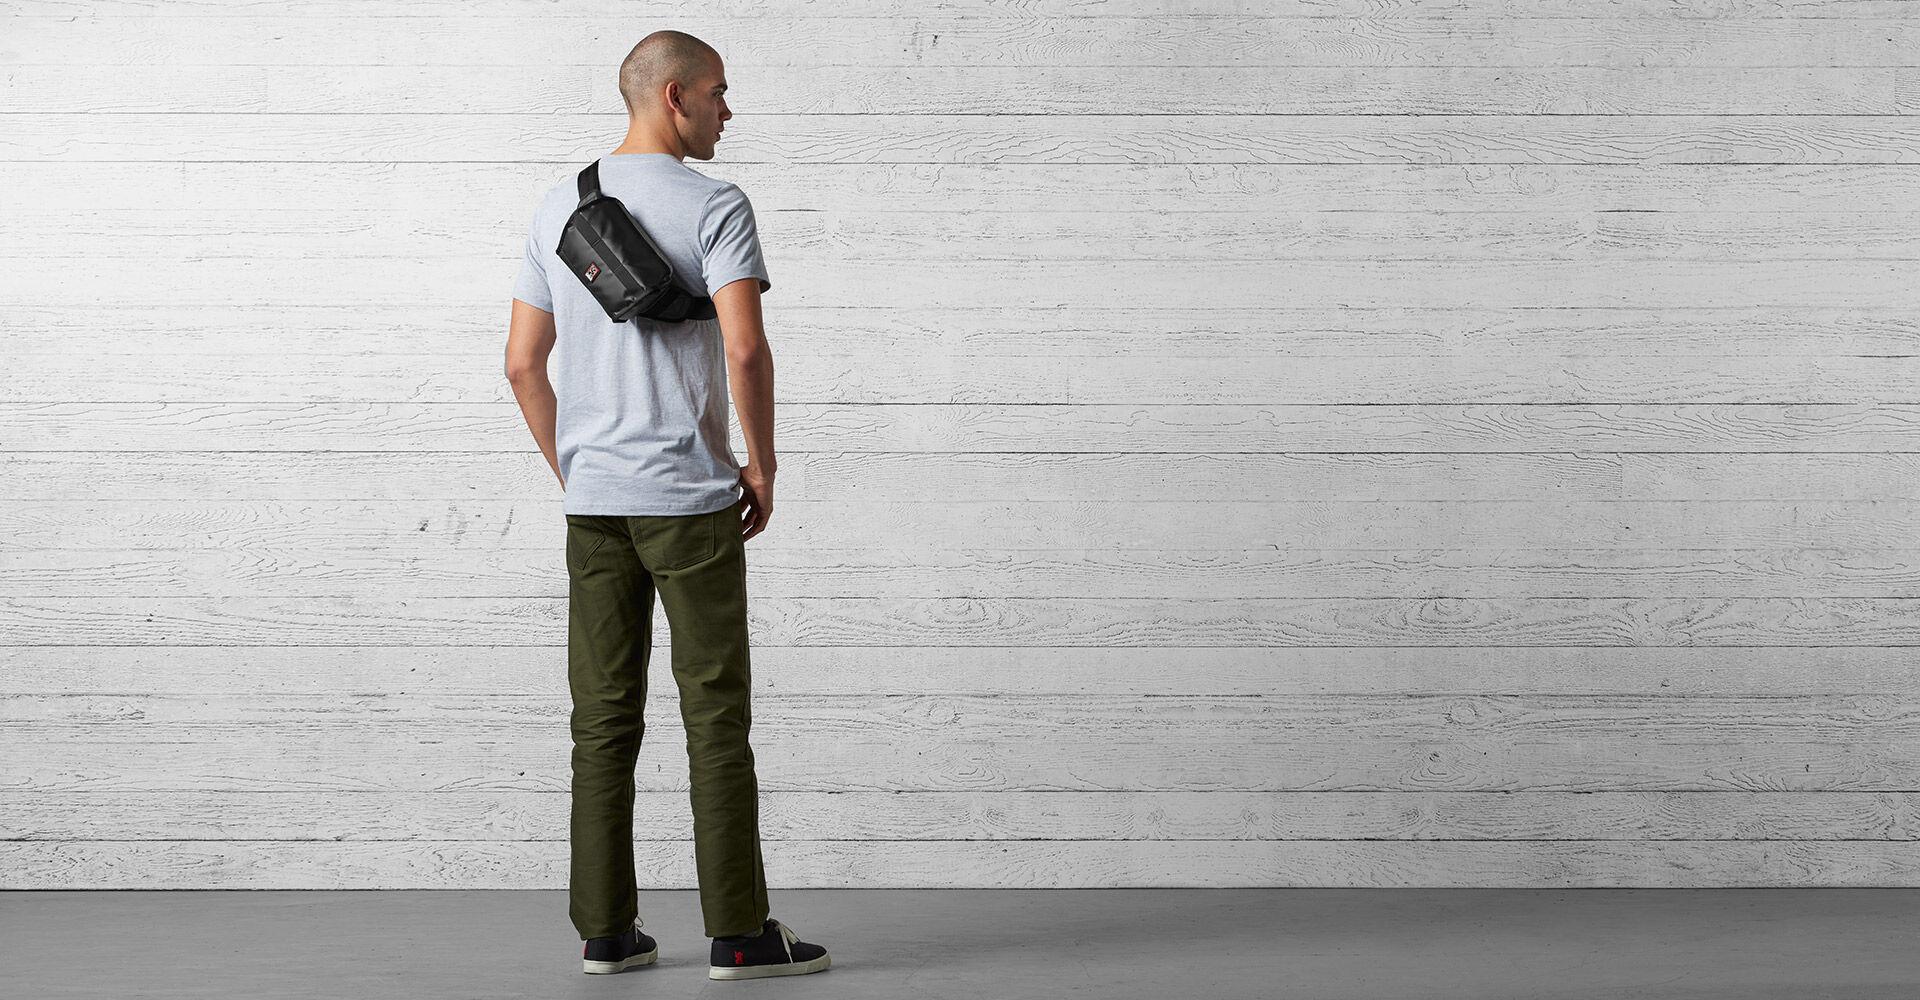 Niko Sling Messenger Bag in Black - wide view.